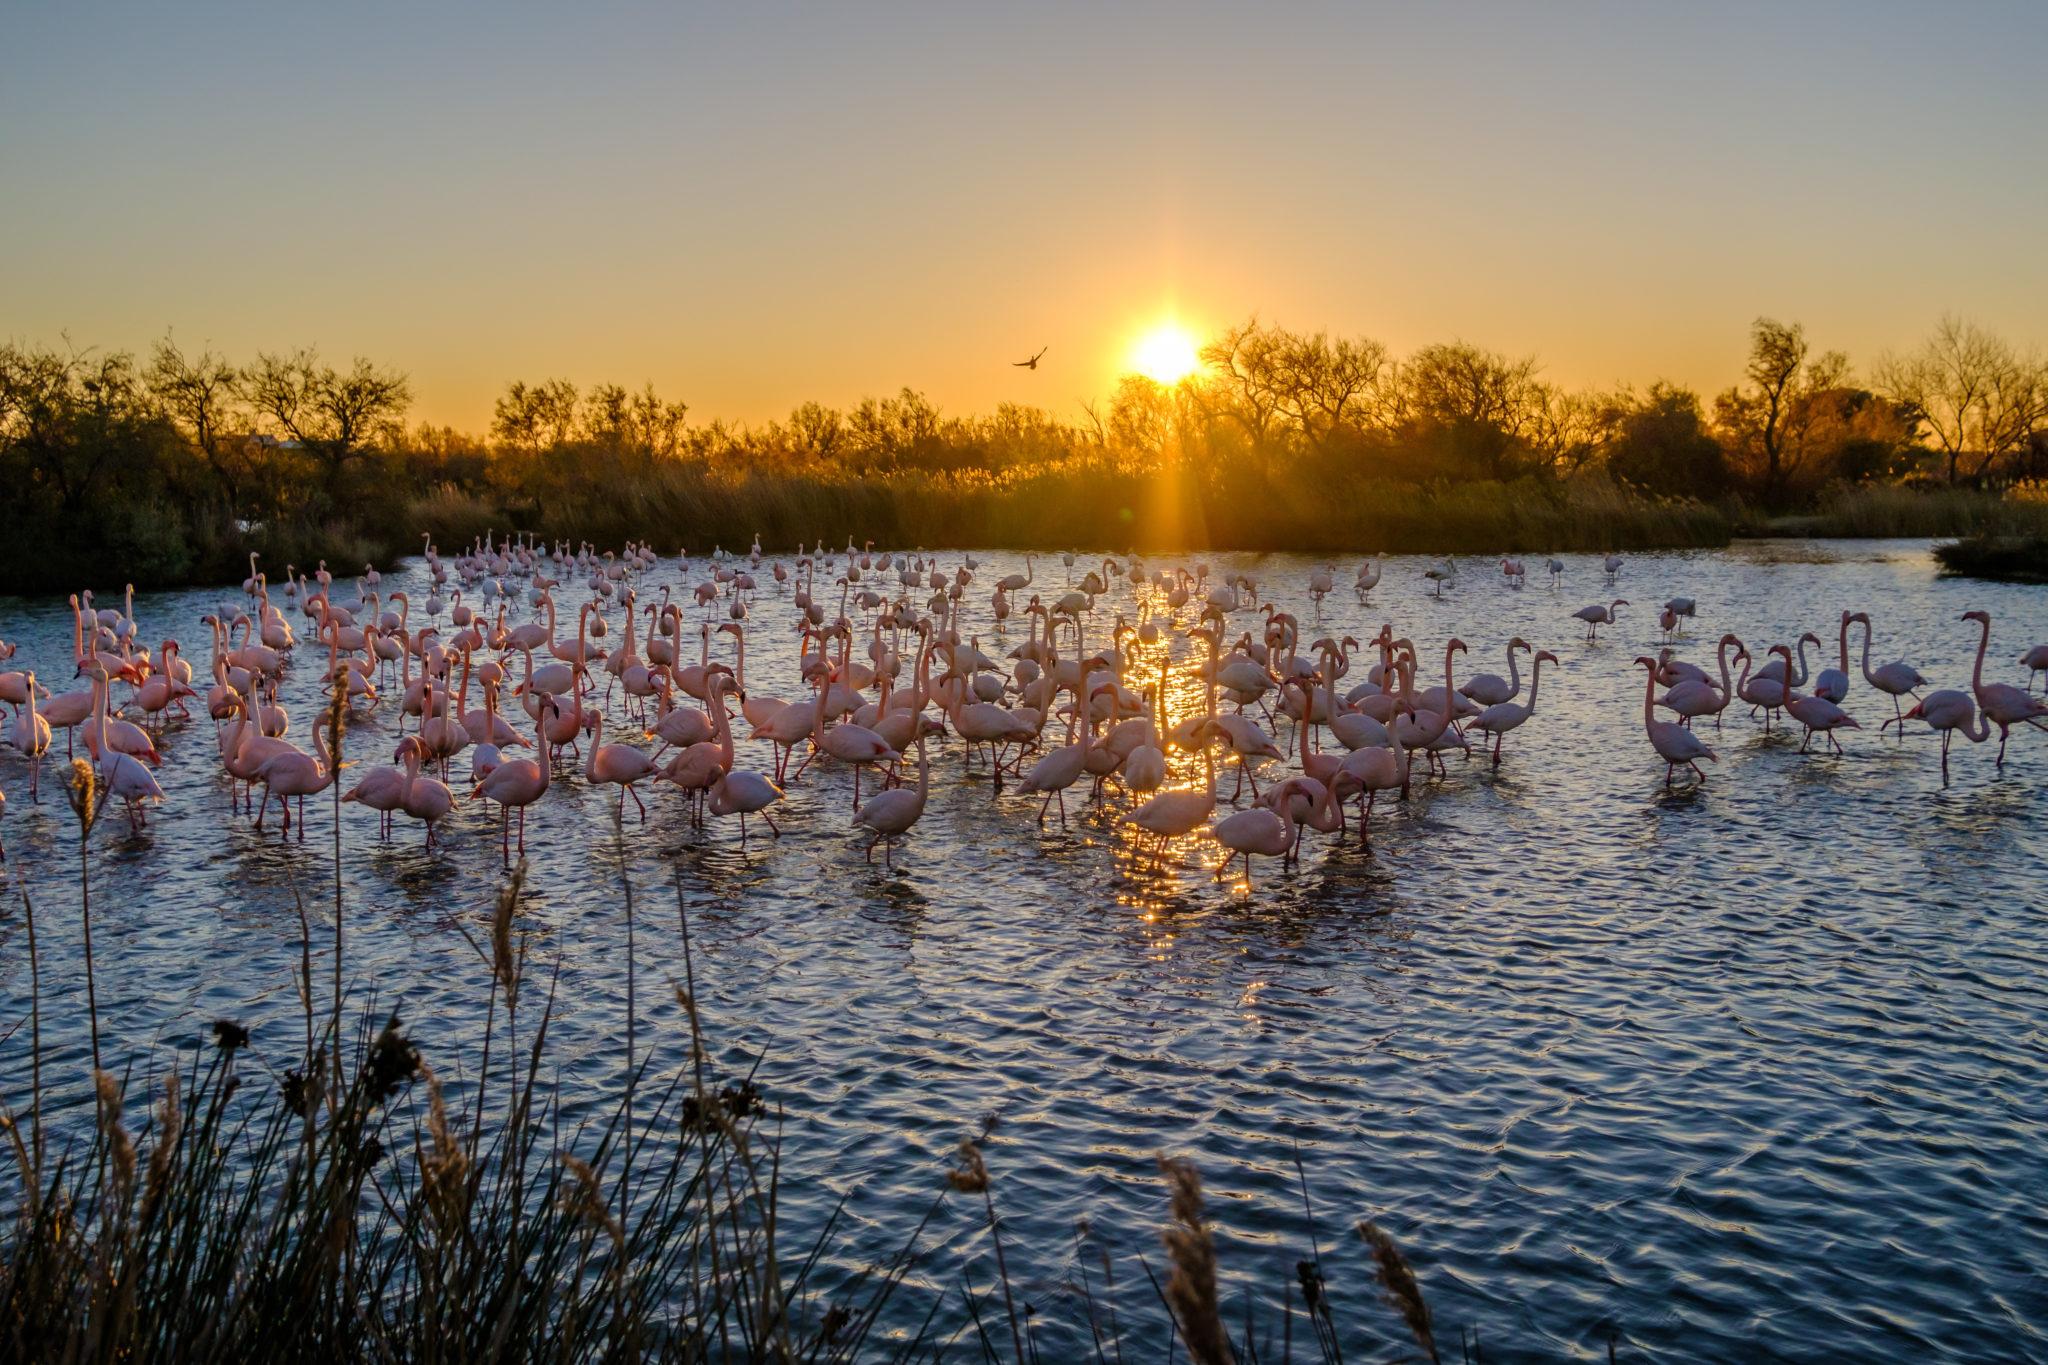 Flamingos im Sonnenuntergang der Camargue